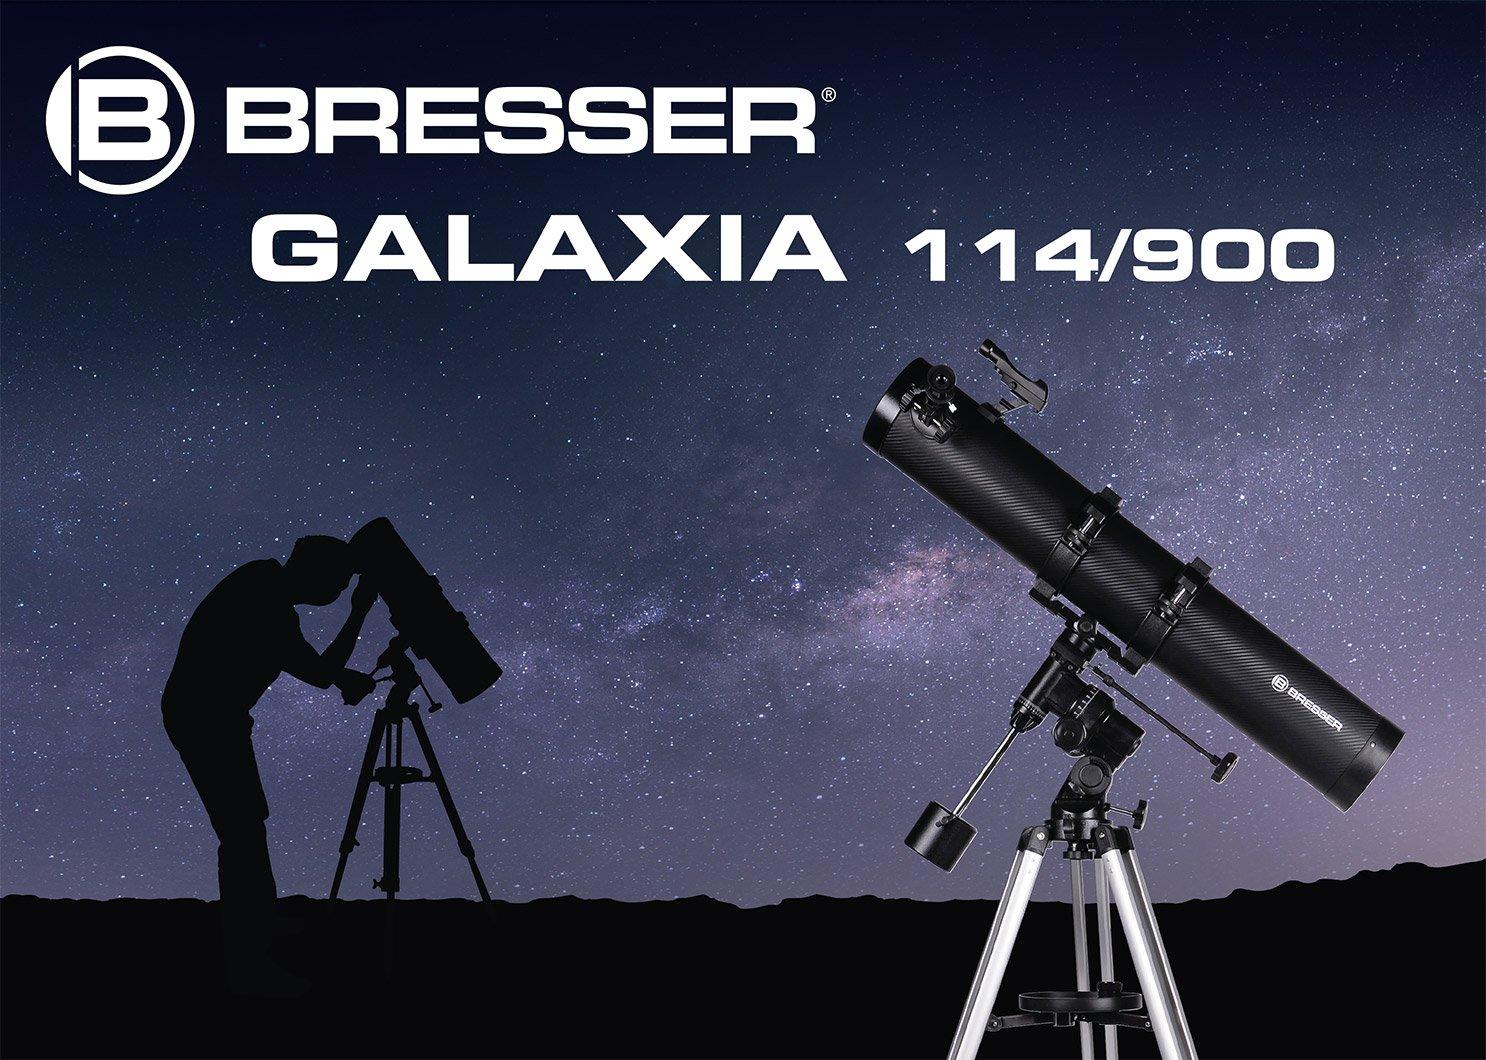 Bresser spiegelteleskop galaxia eq sky 114: amazon.de: kamera